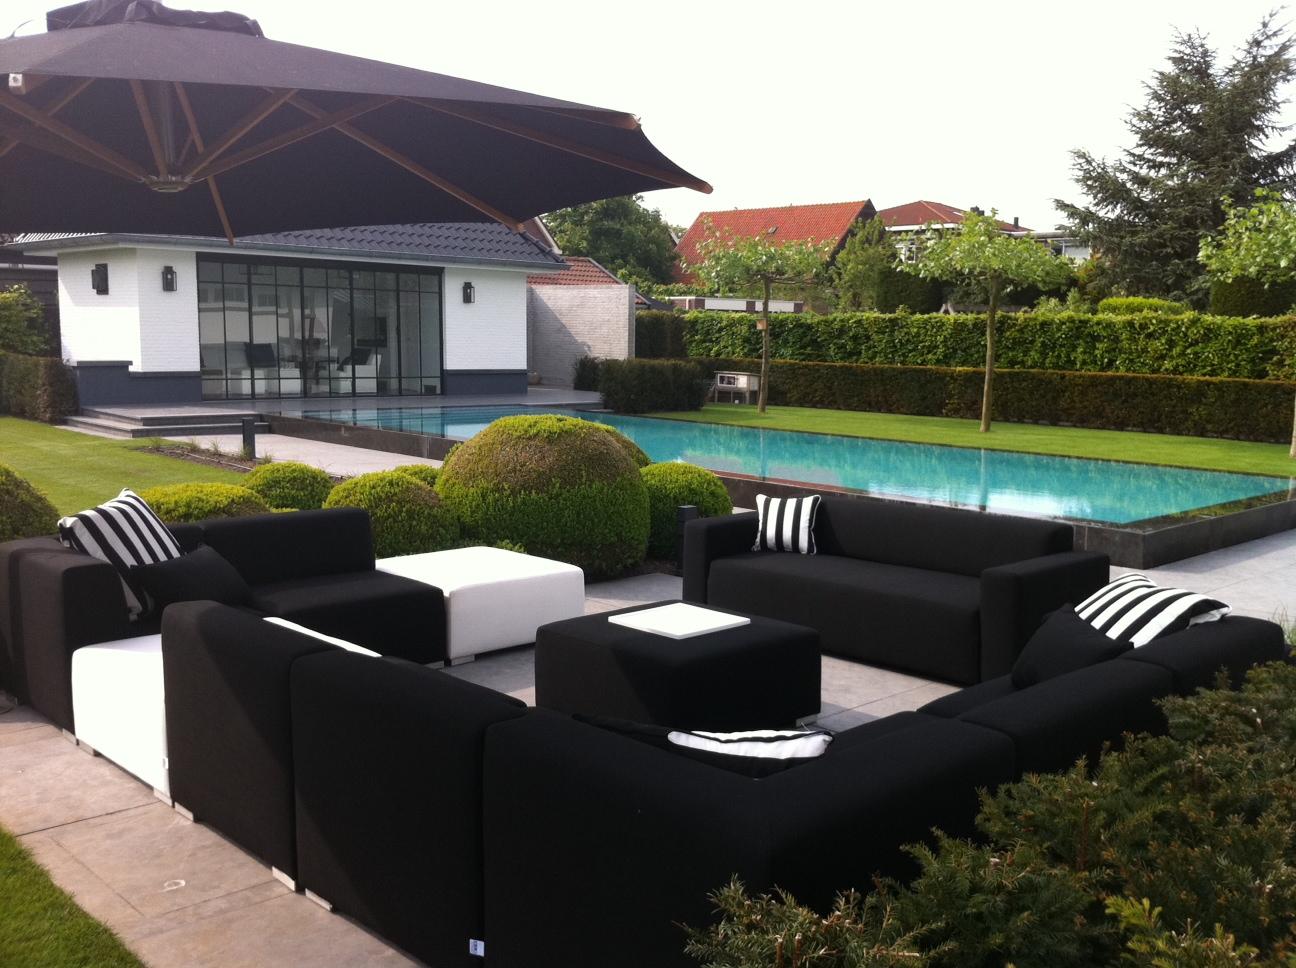 Jan Des Bouvrie Tuinstoelen.Block 90 Design2chill